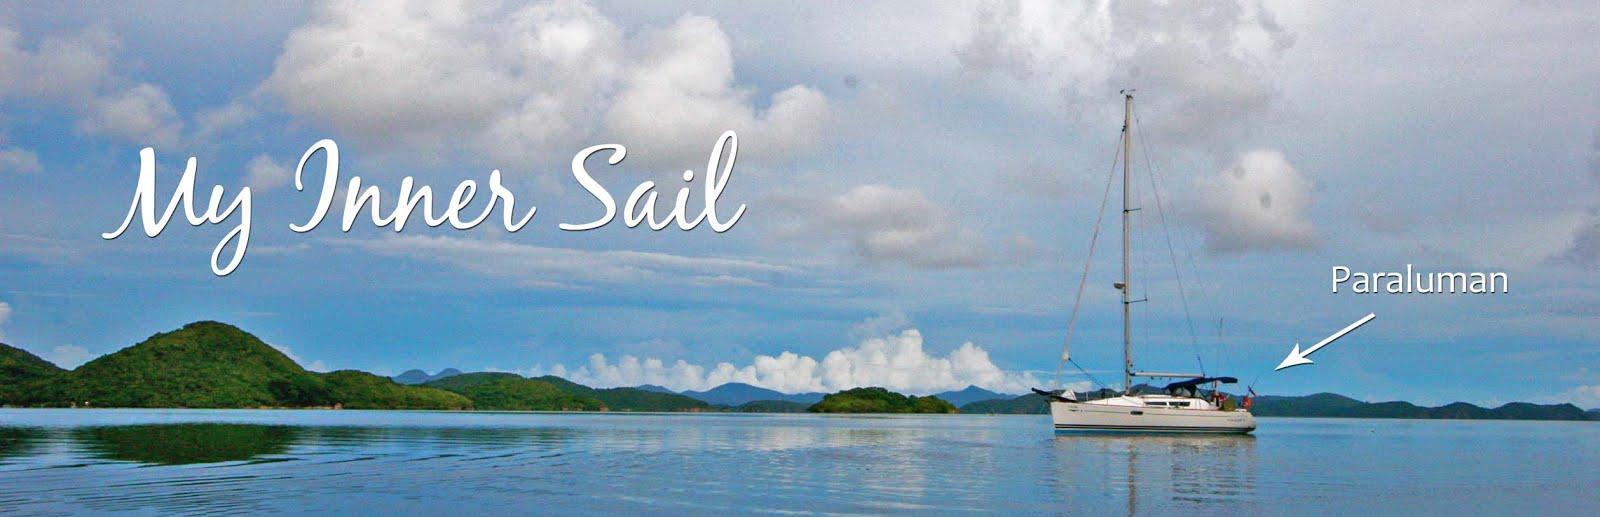 My Inner Sail